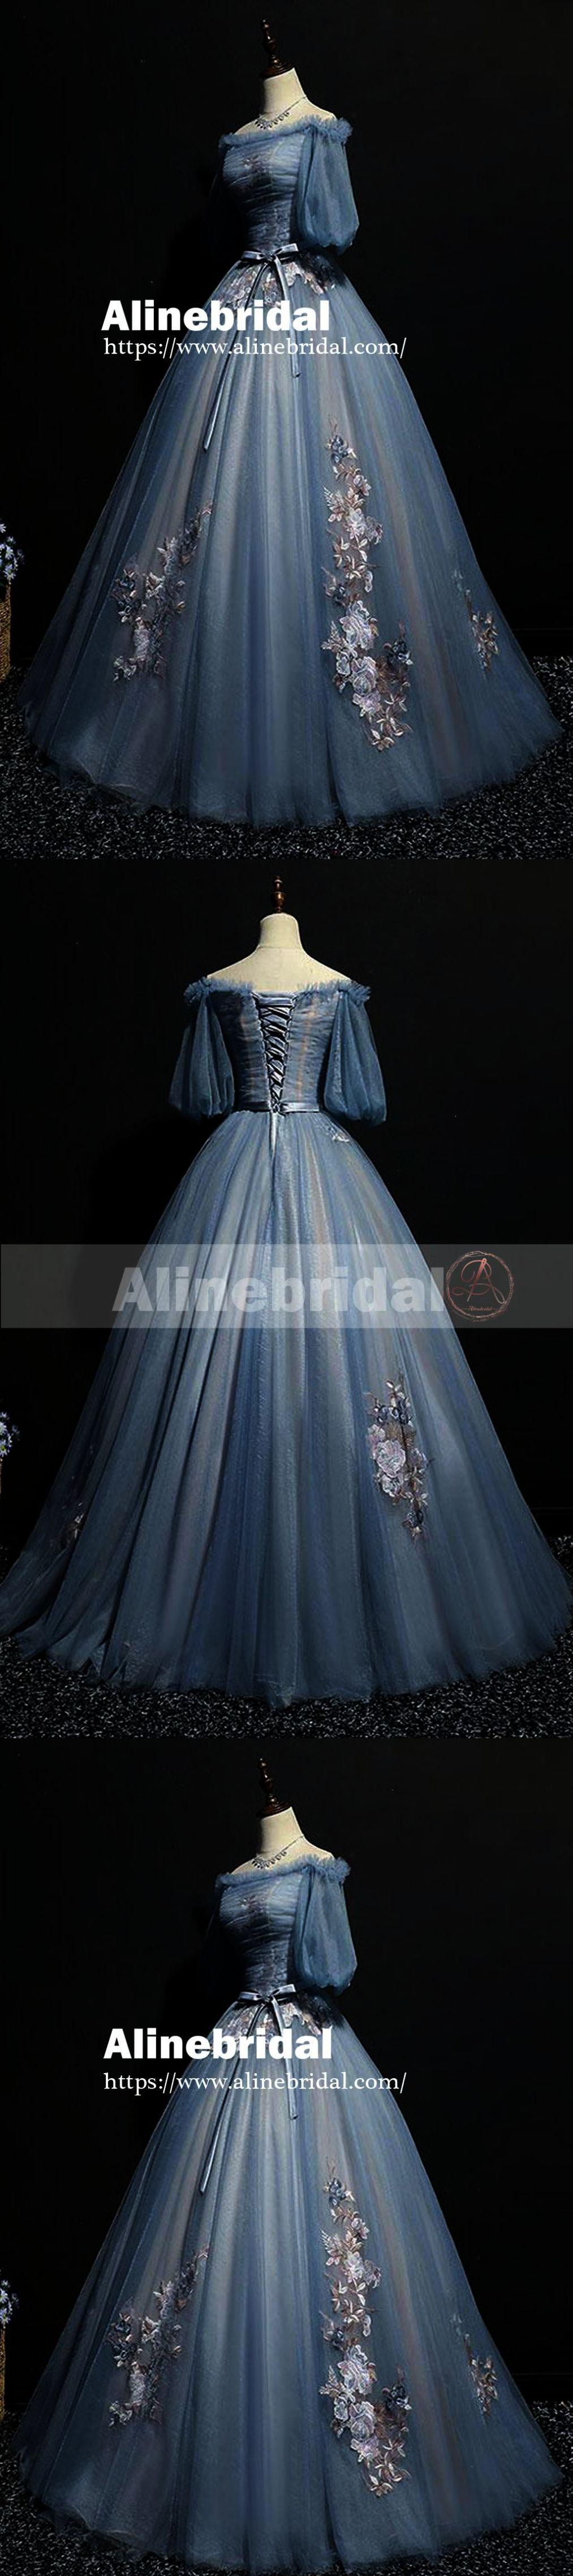 71833b0a28 Vintage Princess Off Shoulder Half Sleeve Sky Blue Appliques Ball Gown Prom  DressesPD00076